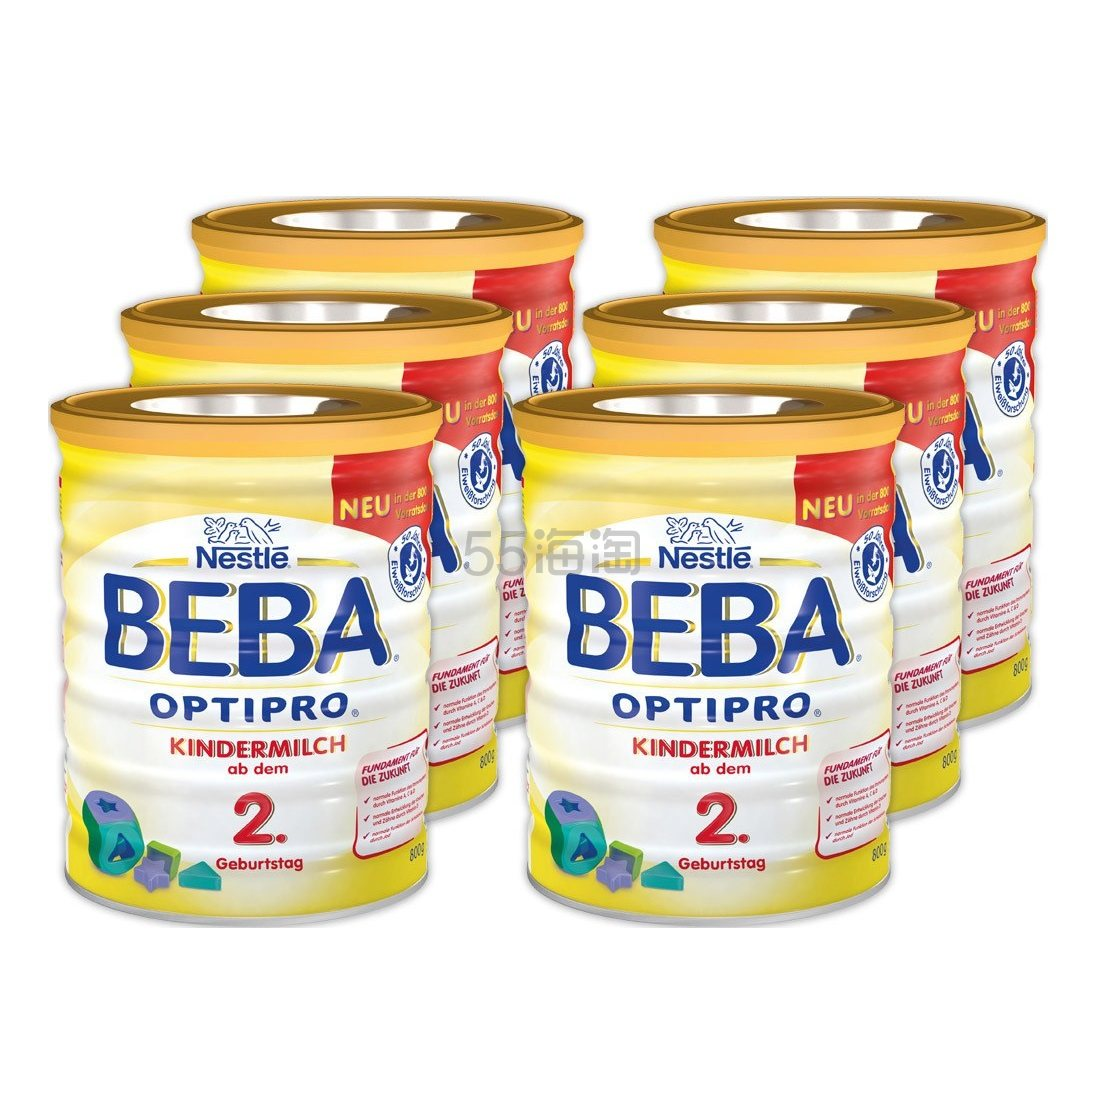 Nestle 雀巢 Beba 贝巴 Optipro 超级能恩婴幼儿奶粉 1段 800g*6罐 €67.07(约526元) - 海淘优惠海淘折扣|55海淘网